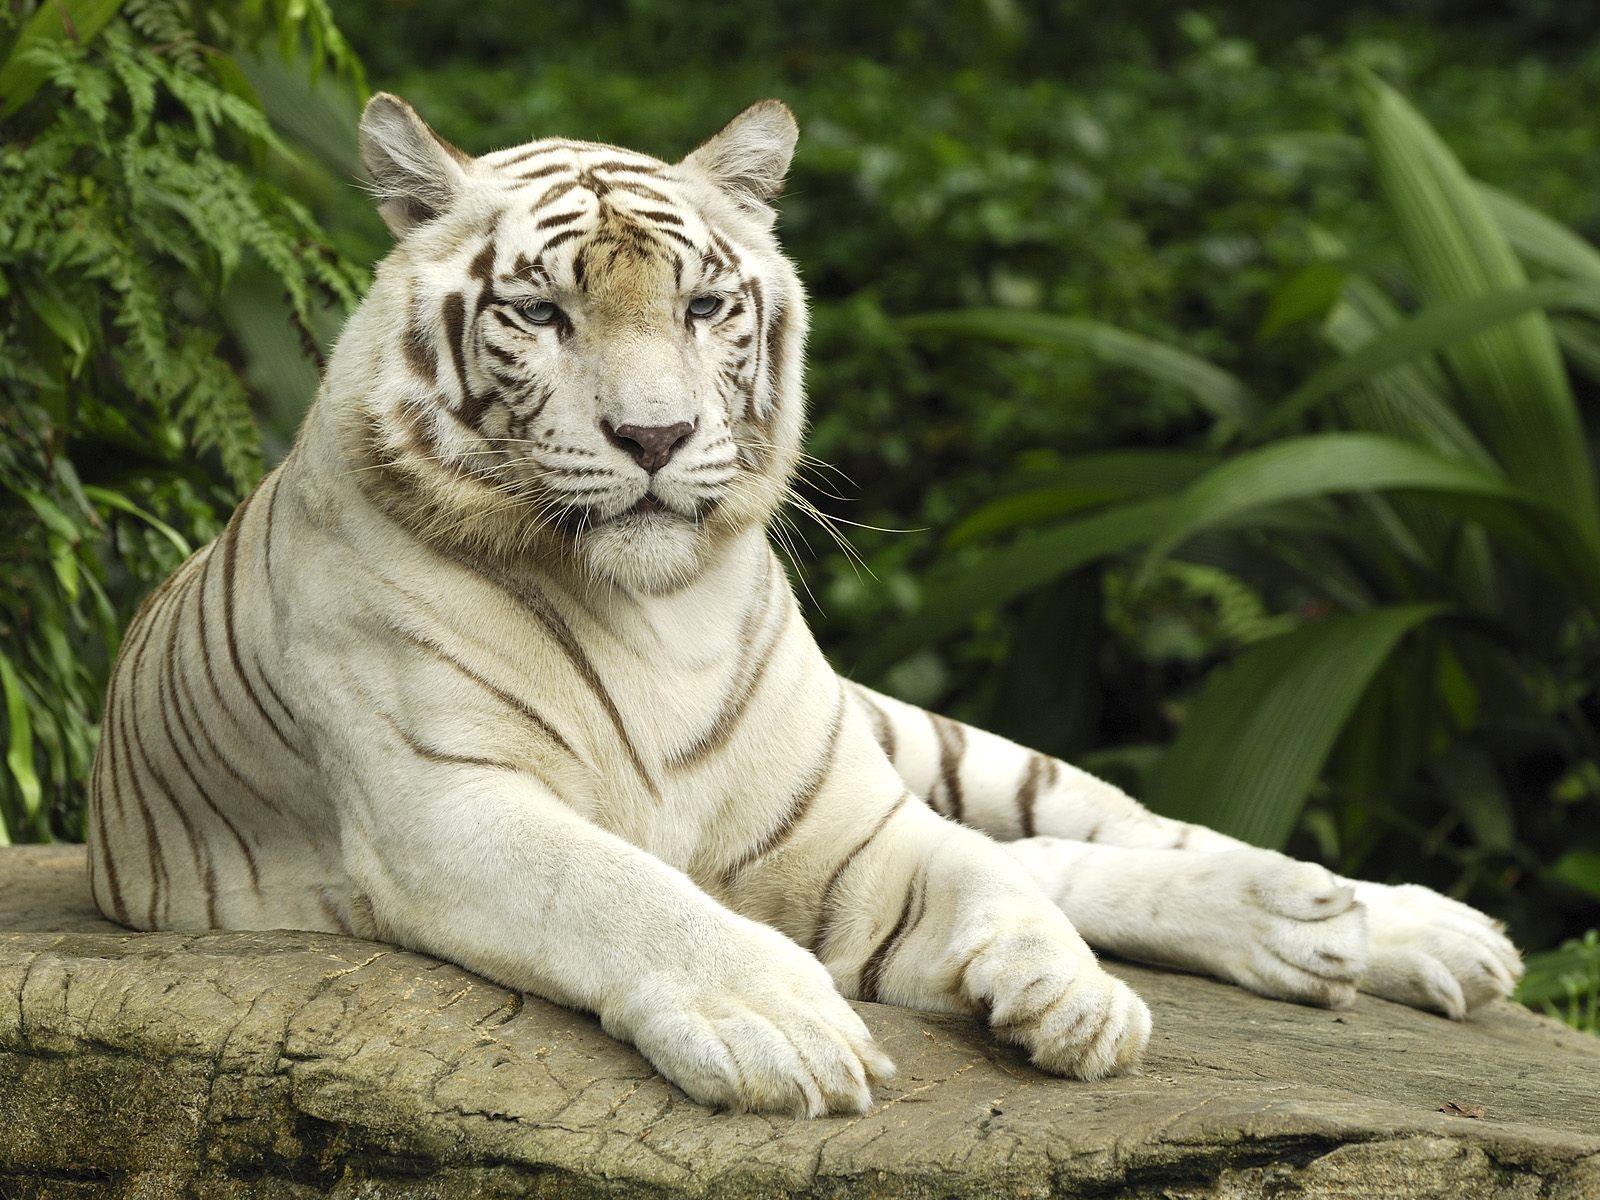 White Bengal Tigers Latest Hd Wallpaper 2013 Top hd 1600x1200